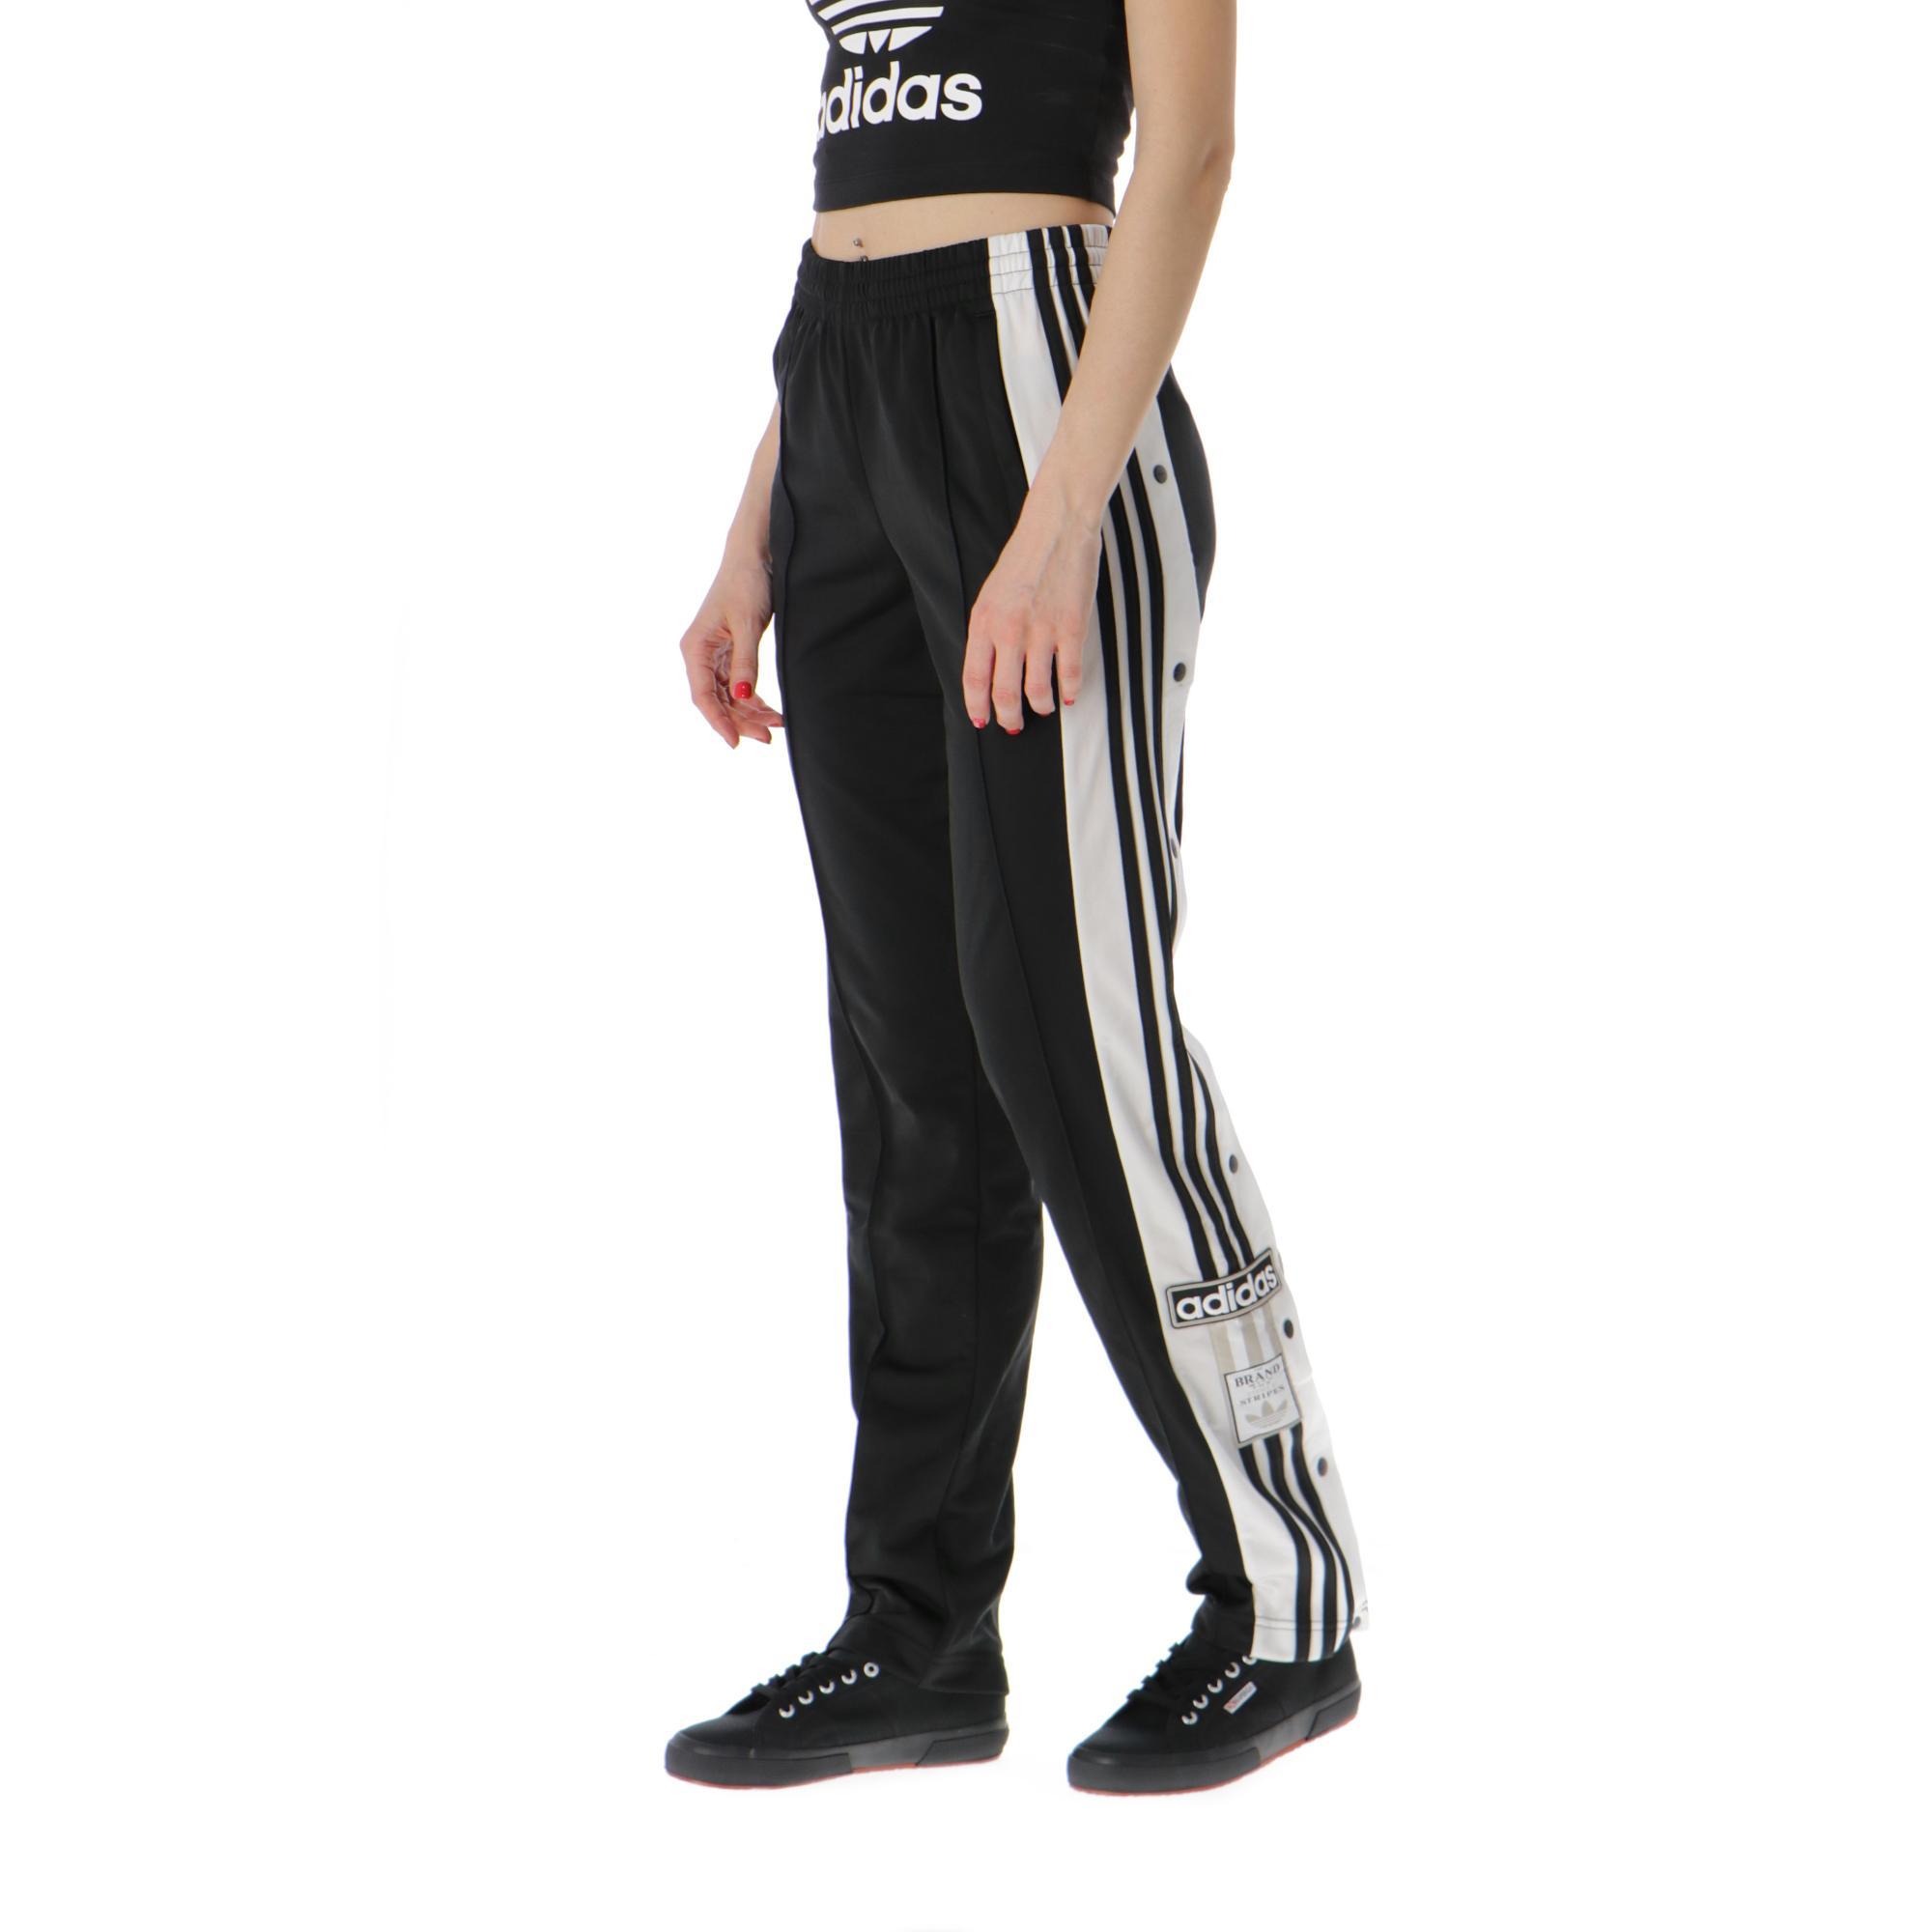 Adidas Og Adibreak Track Pant Black carbon